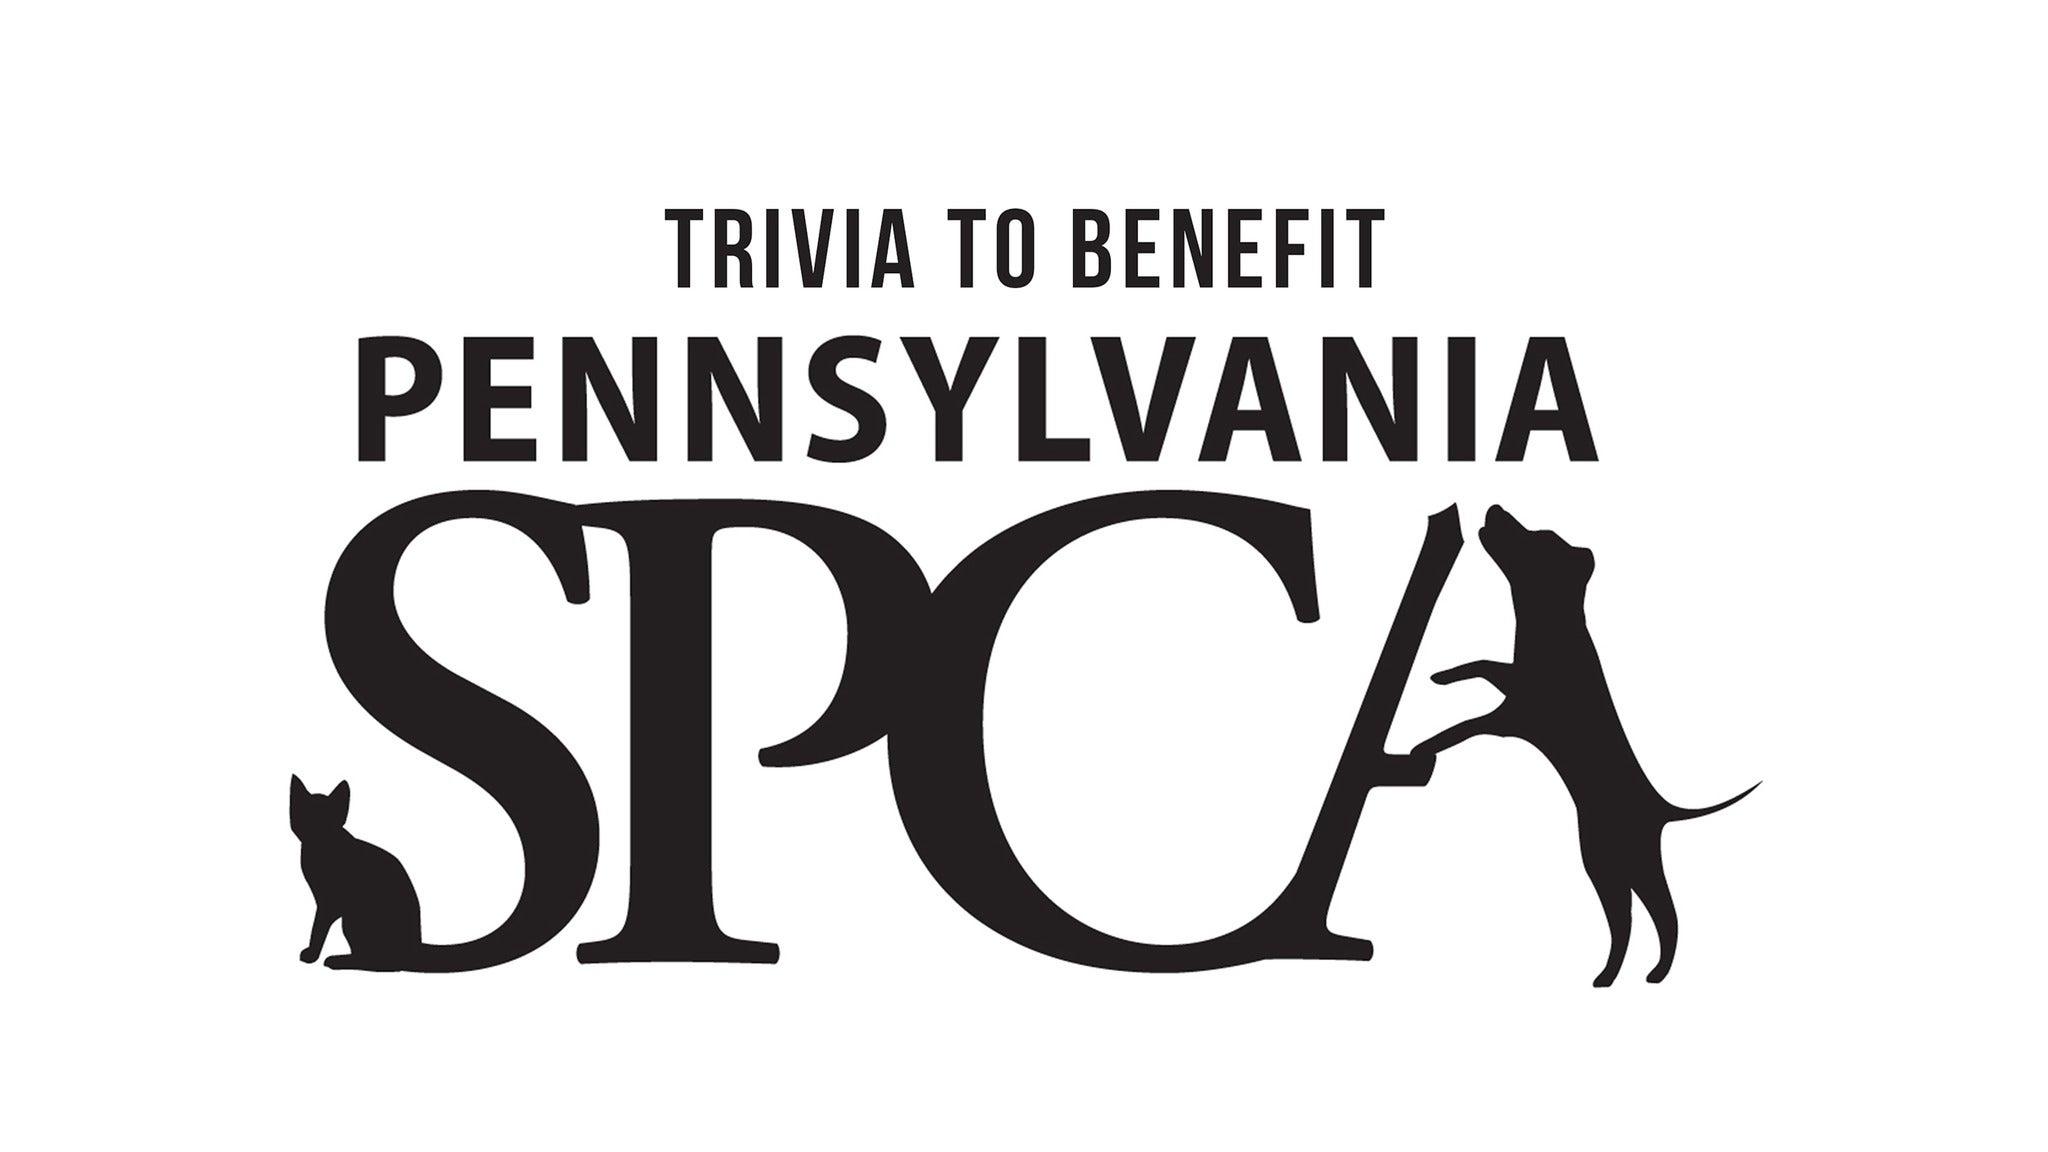 Schitt's Creek Trivia to Benefit the PSPCA